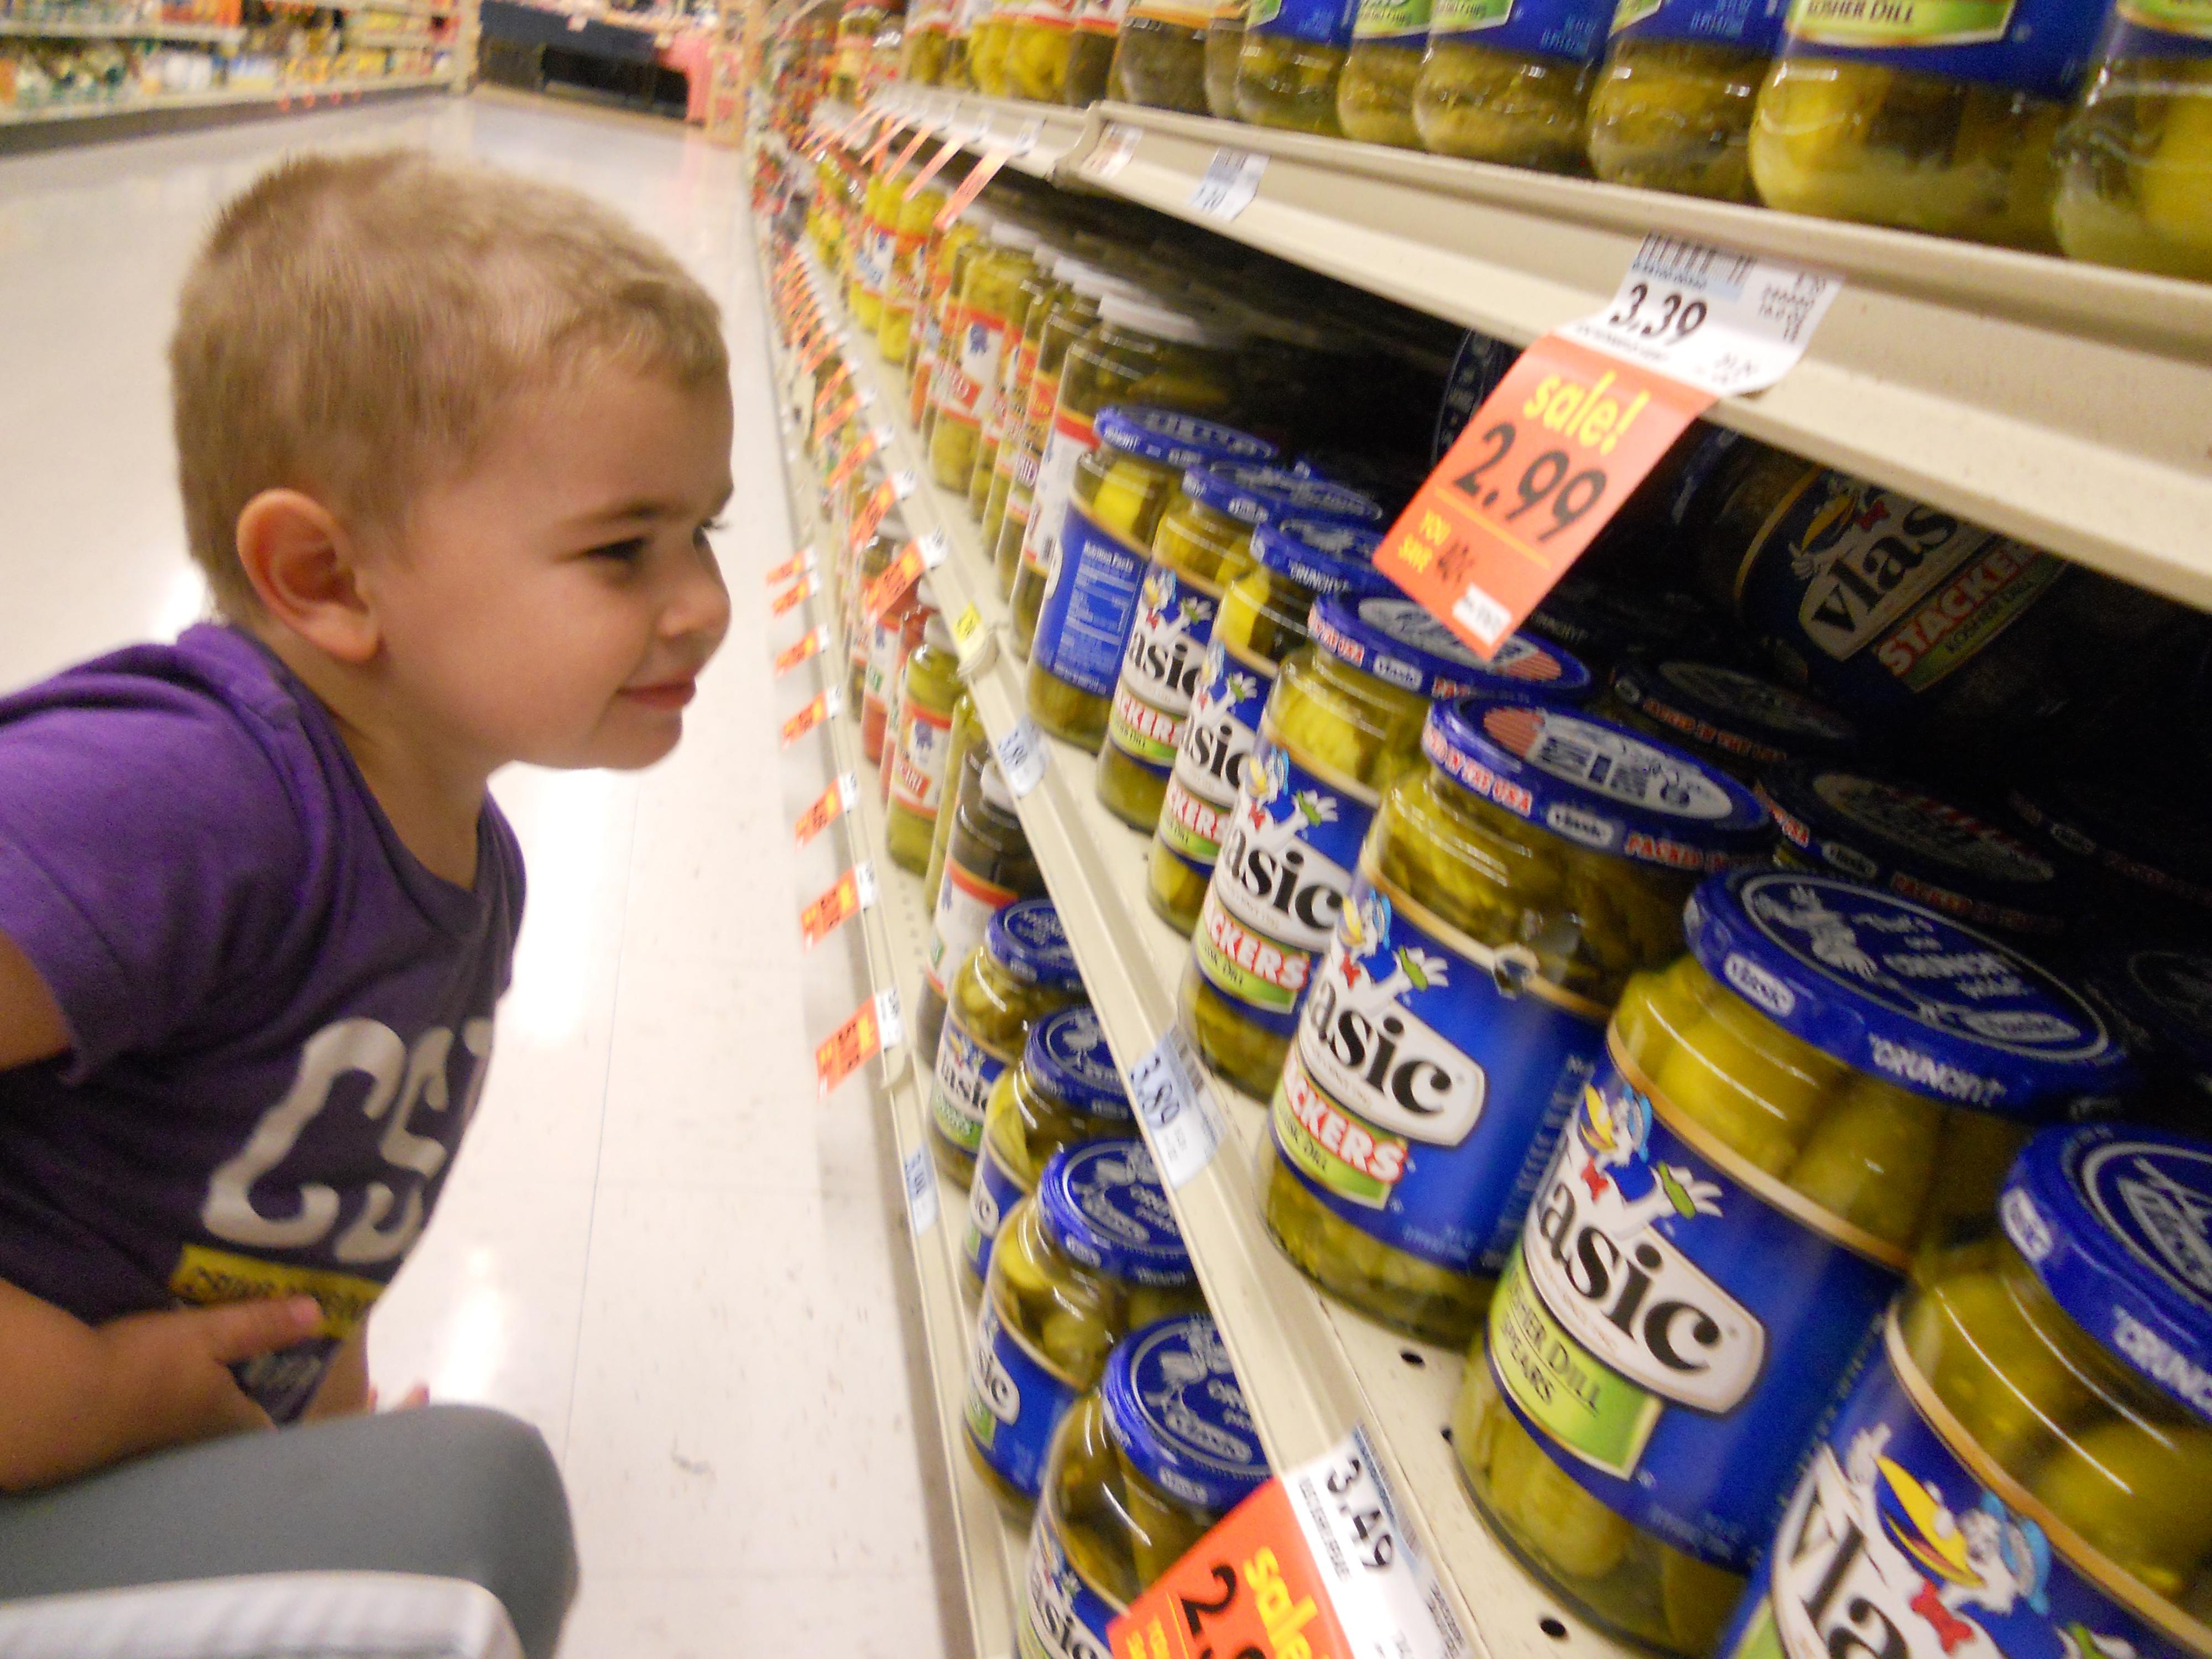 http://cynk.files.wordpress.com/2012/08/pickles-001.jpg